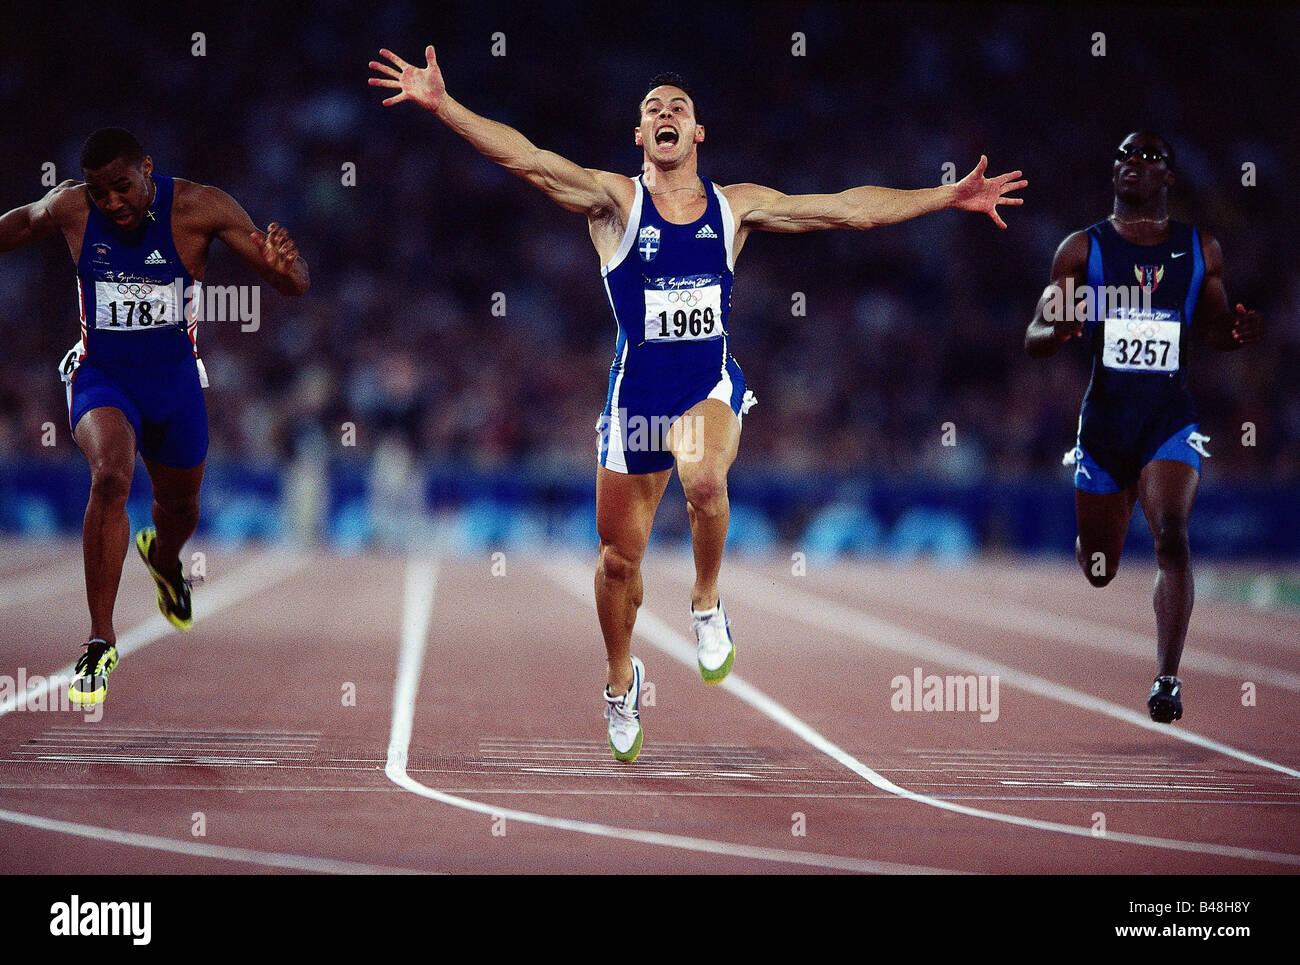 Konstantinos, Kenteris, * 11.7.1973, Greek athlete (athletics), full length, Olympic Games, Sydney, 2000, Additional - Stock Image